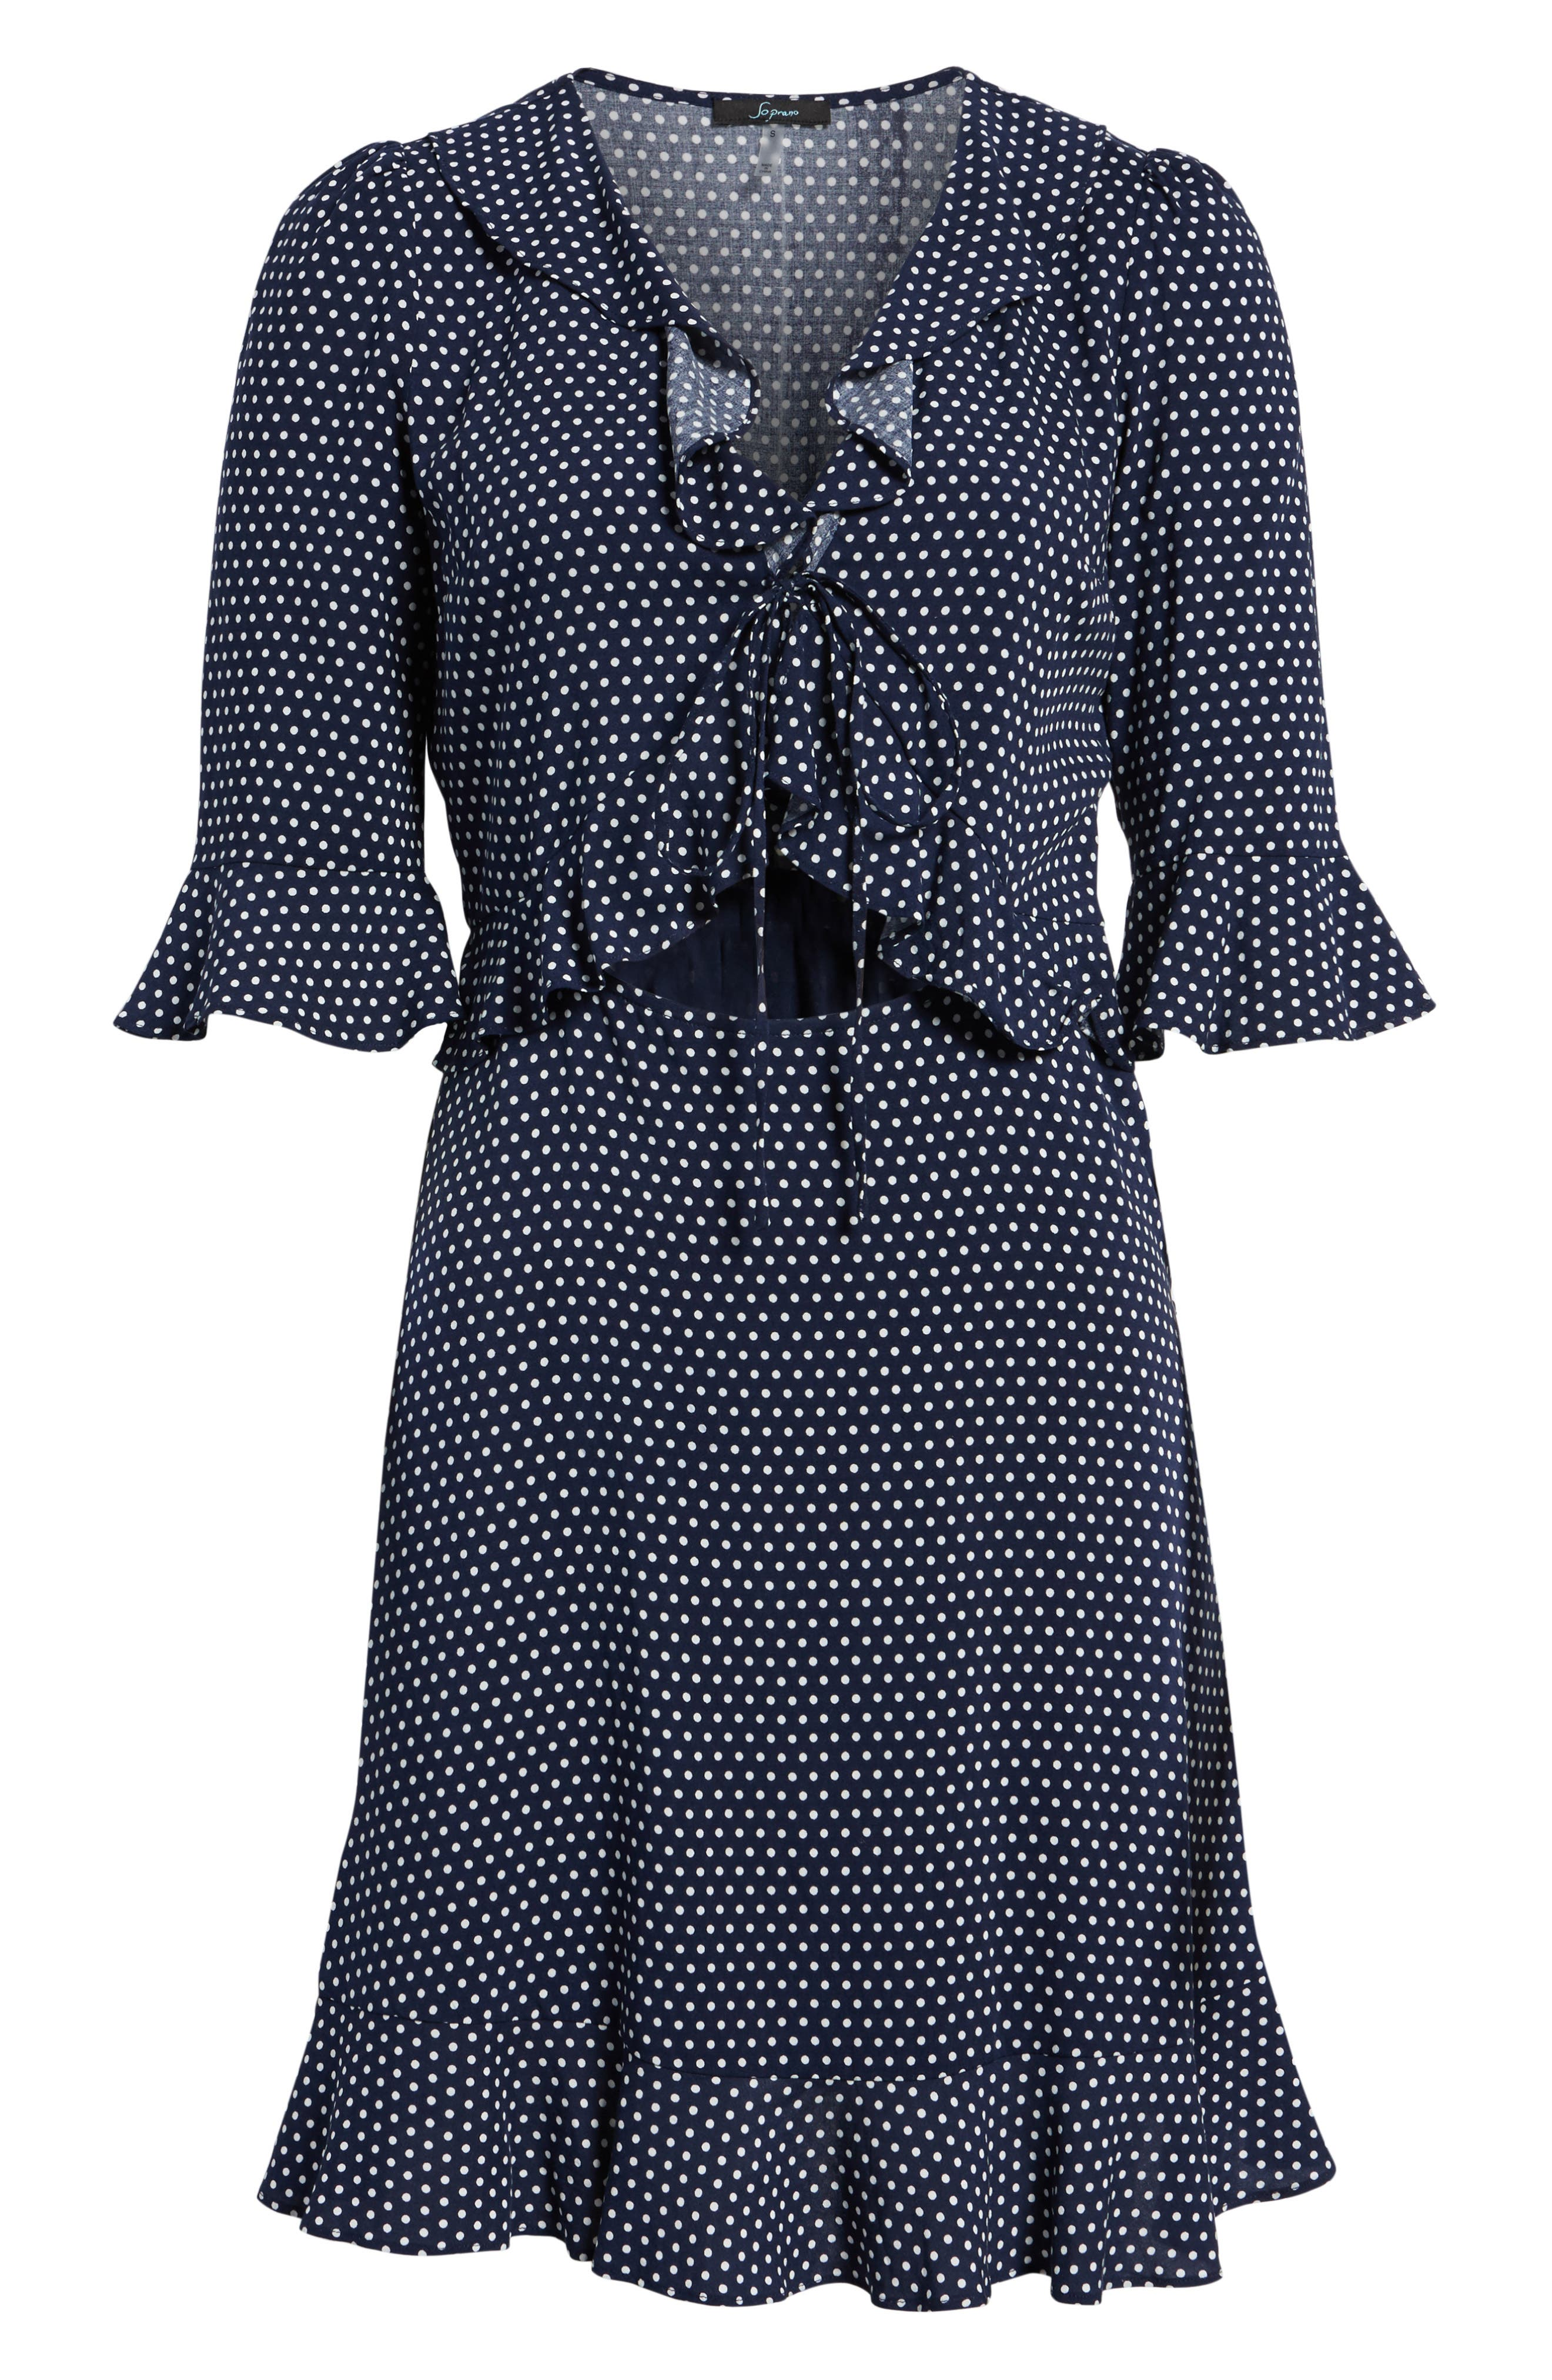 Ruffle Polka Dot Dress,                             Alternate thumbnail 6, color,